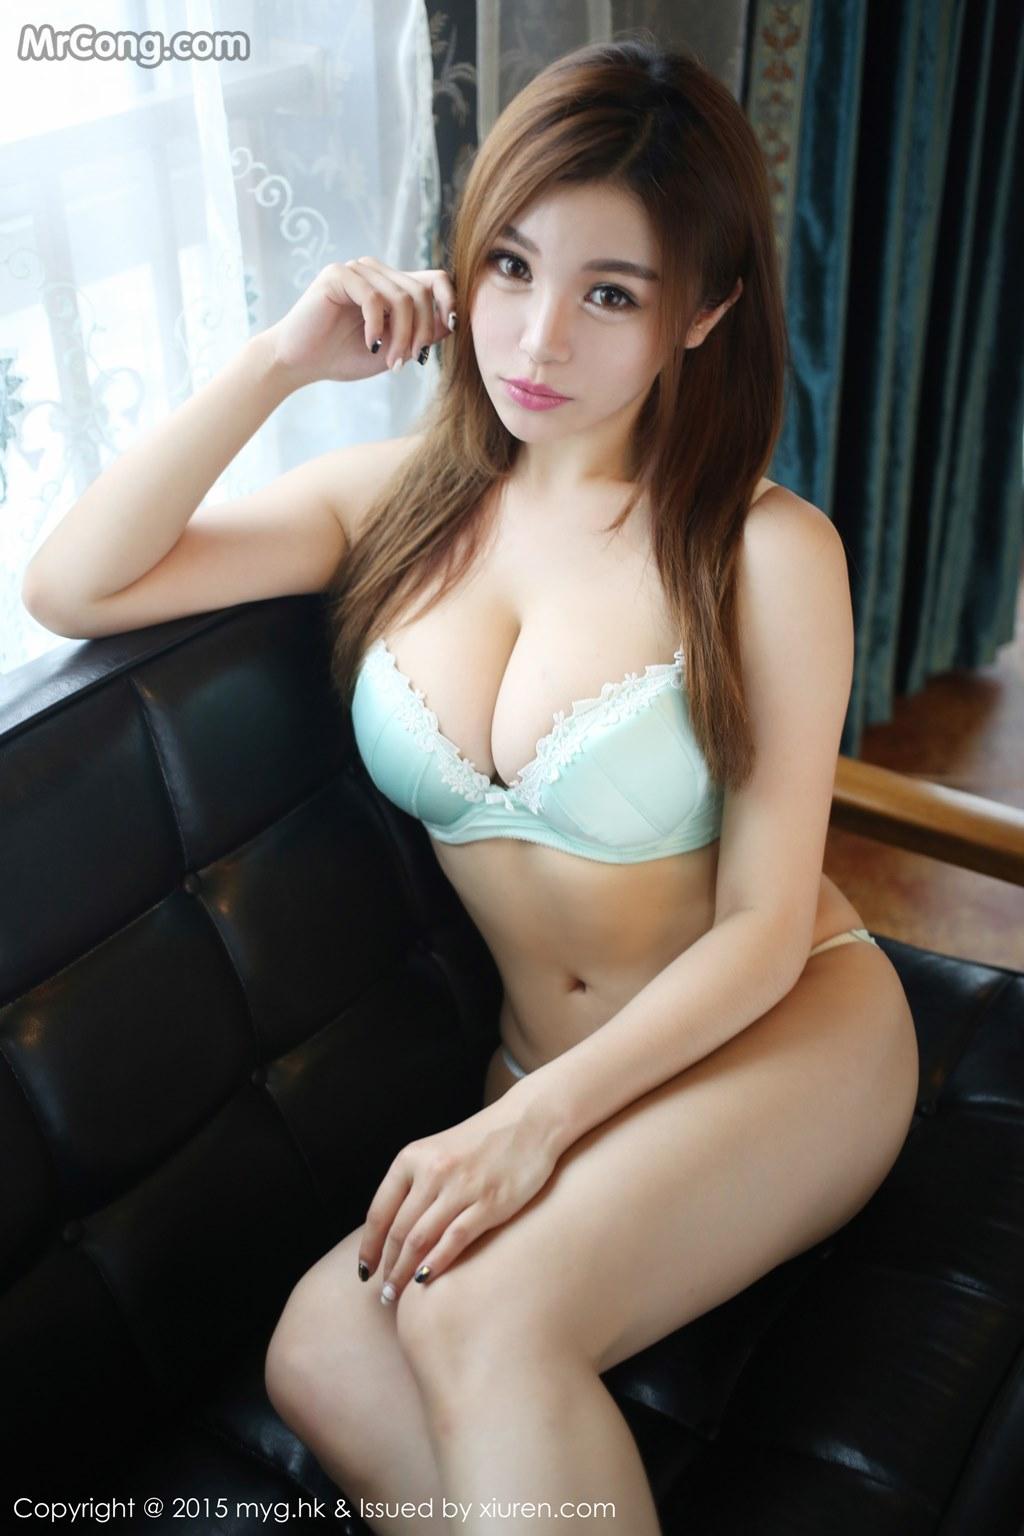 MyGirl Vol.134: Model Liu Ya Xi (刘娅希) (67P)